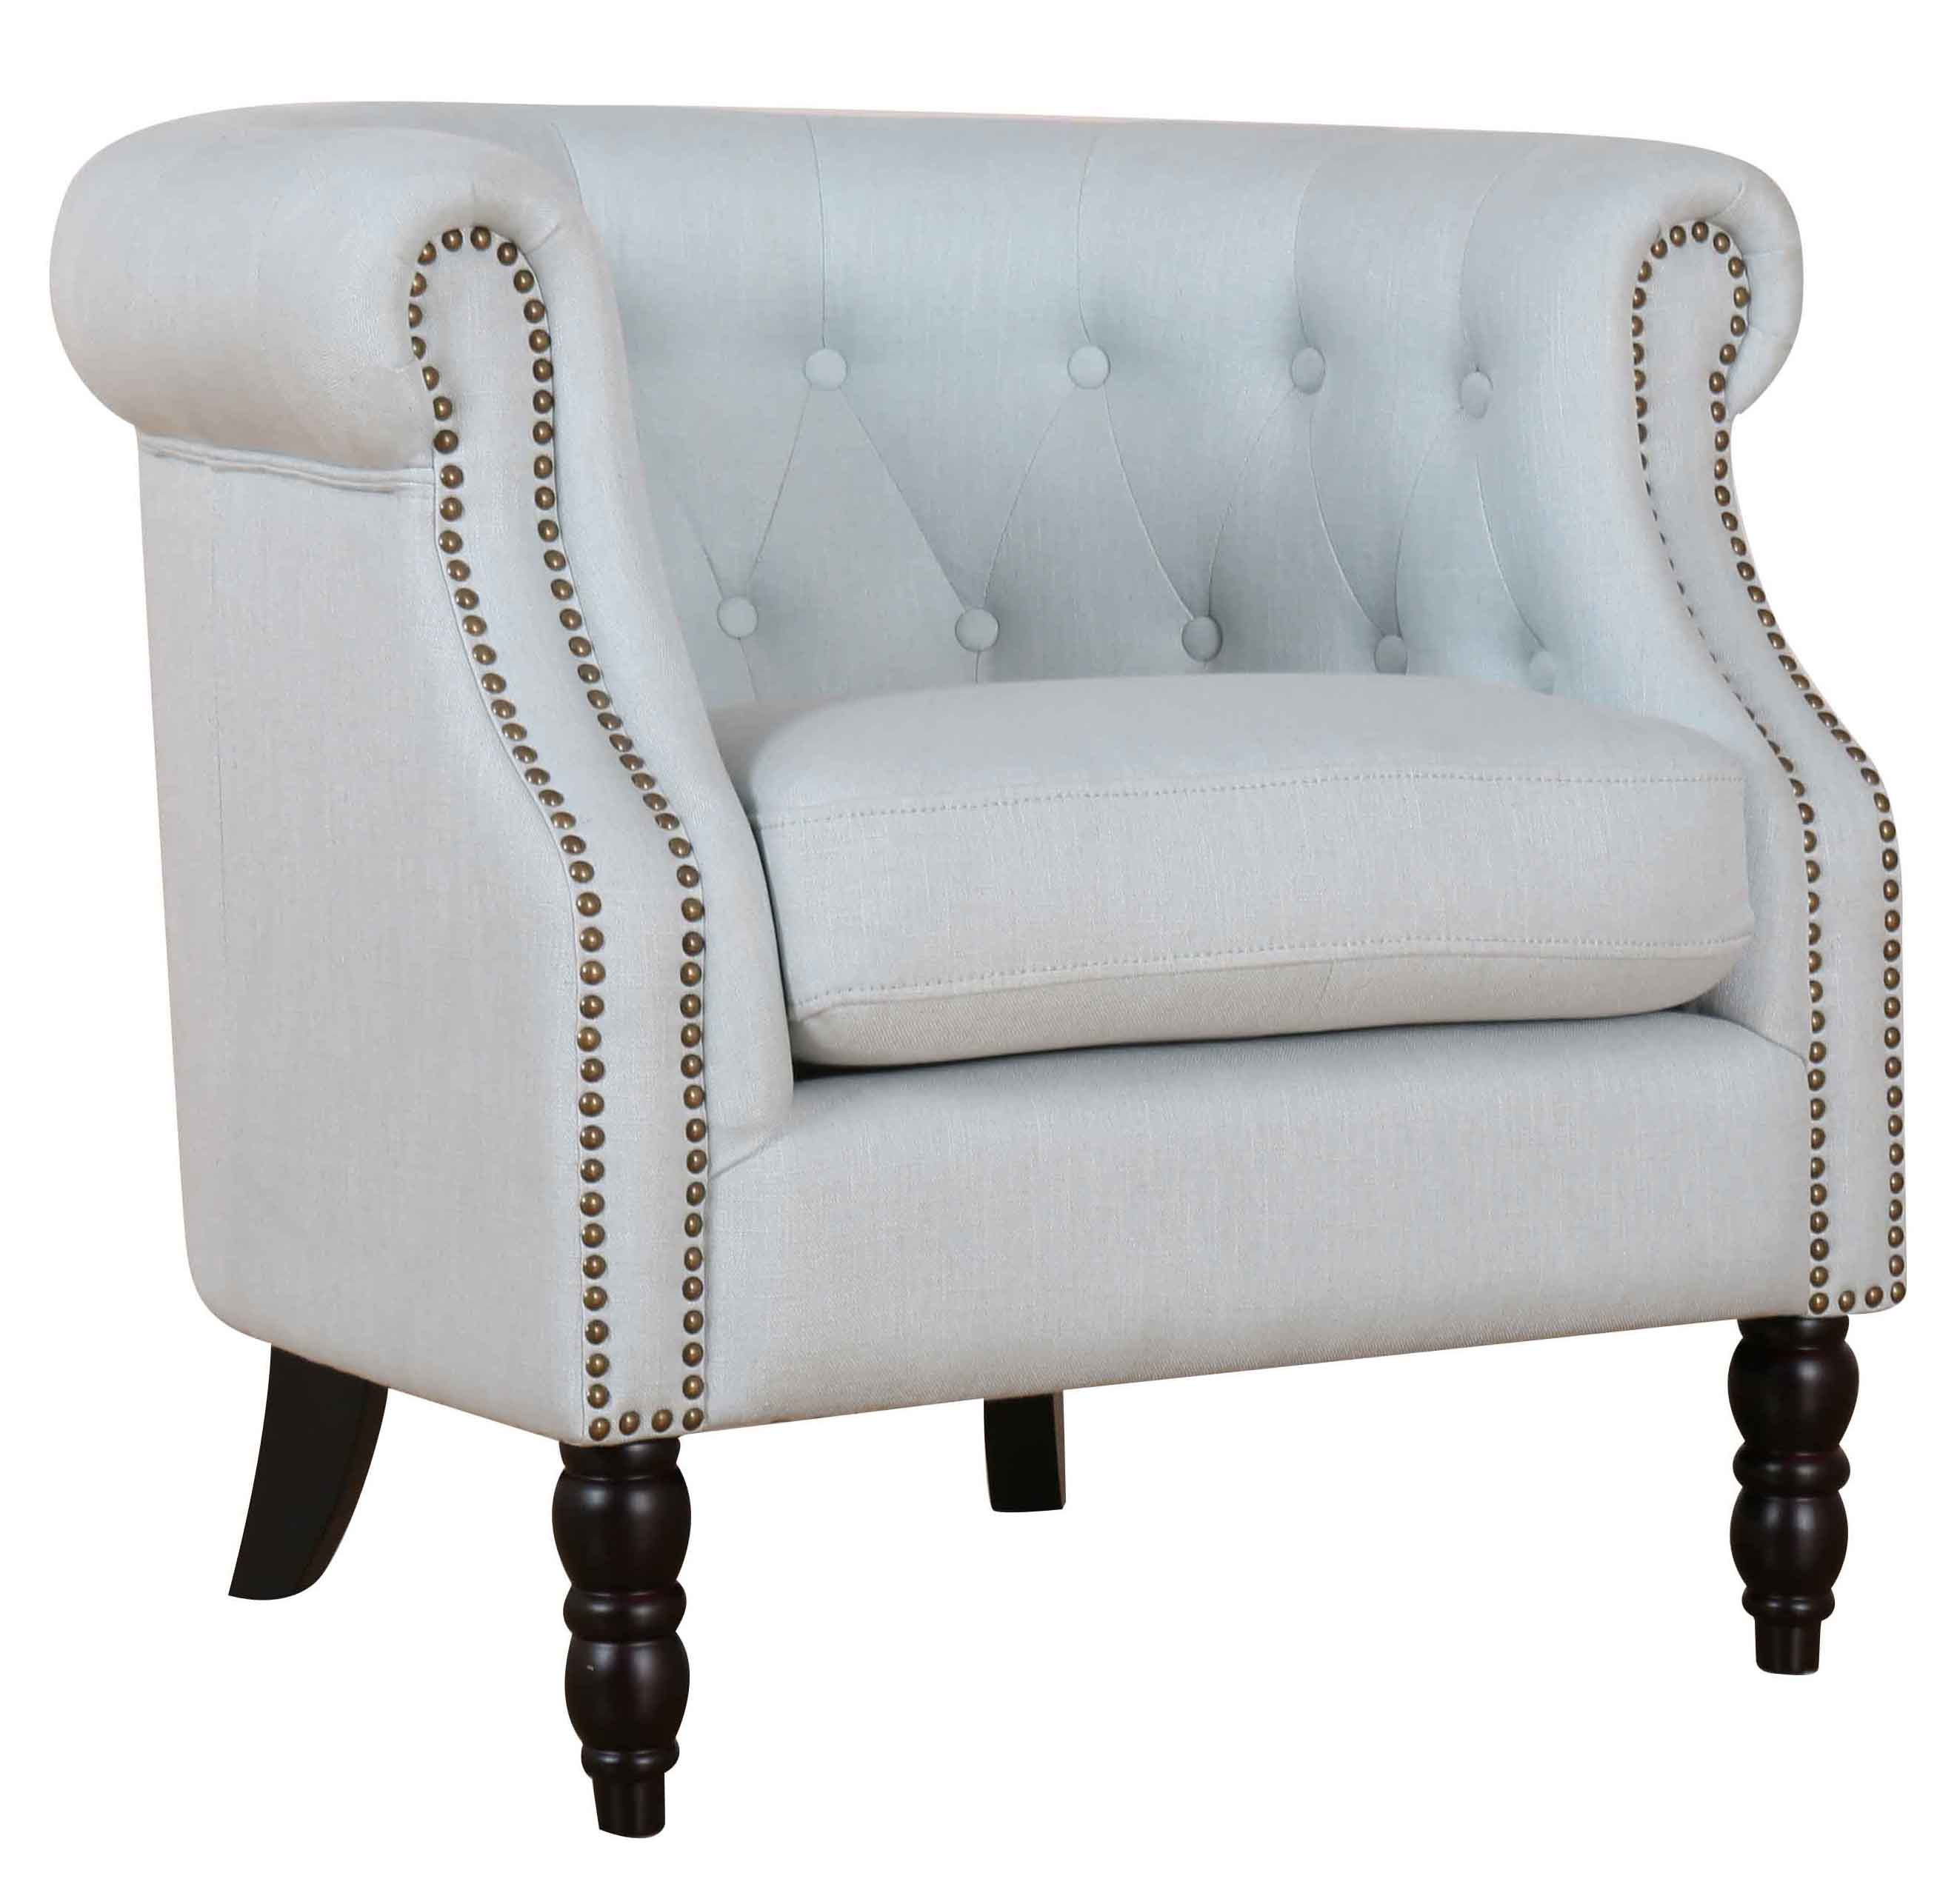 Cosette Chairandrew Martin Origin In Armchairs For Cosette Leather Sofa Chairs (Image 12 of 25)